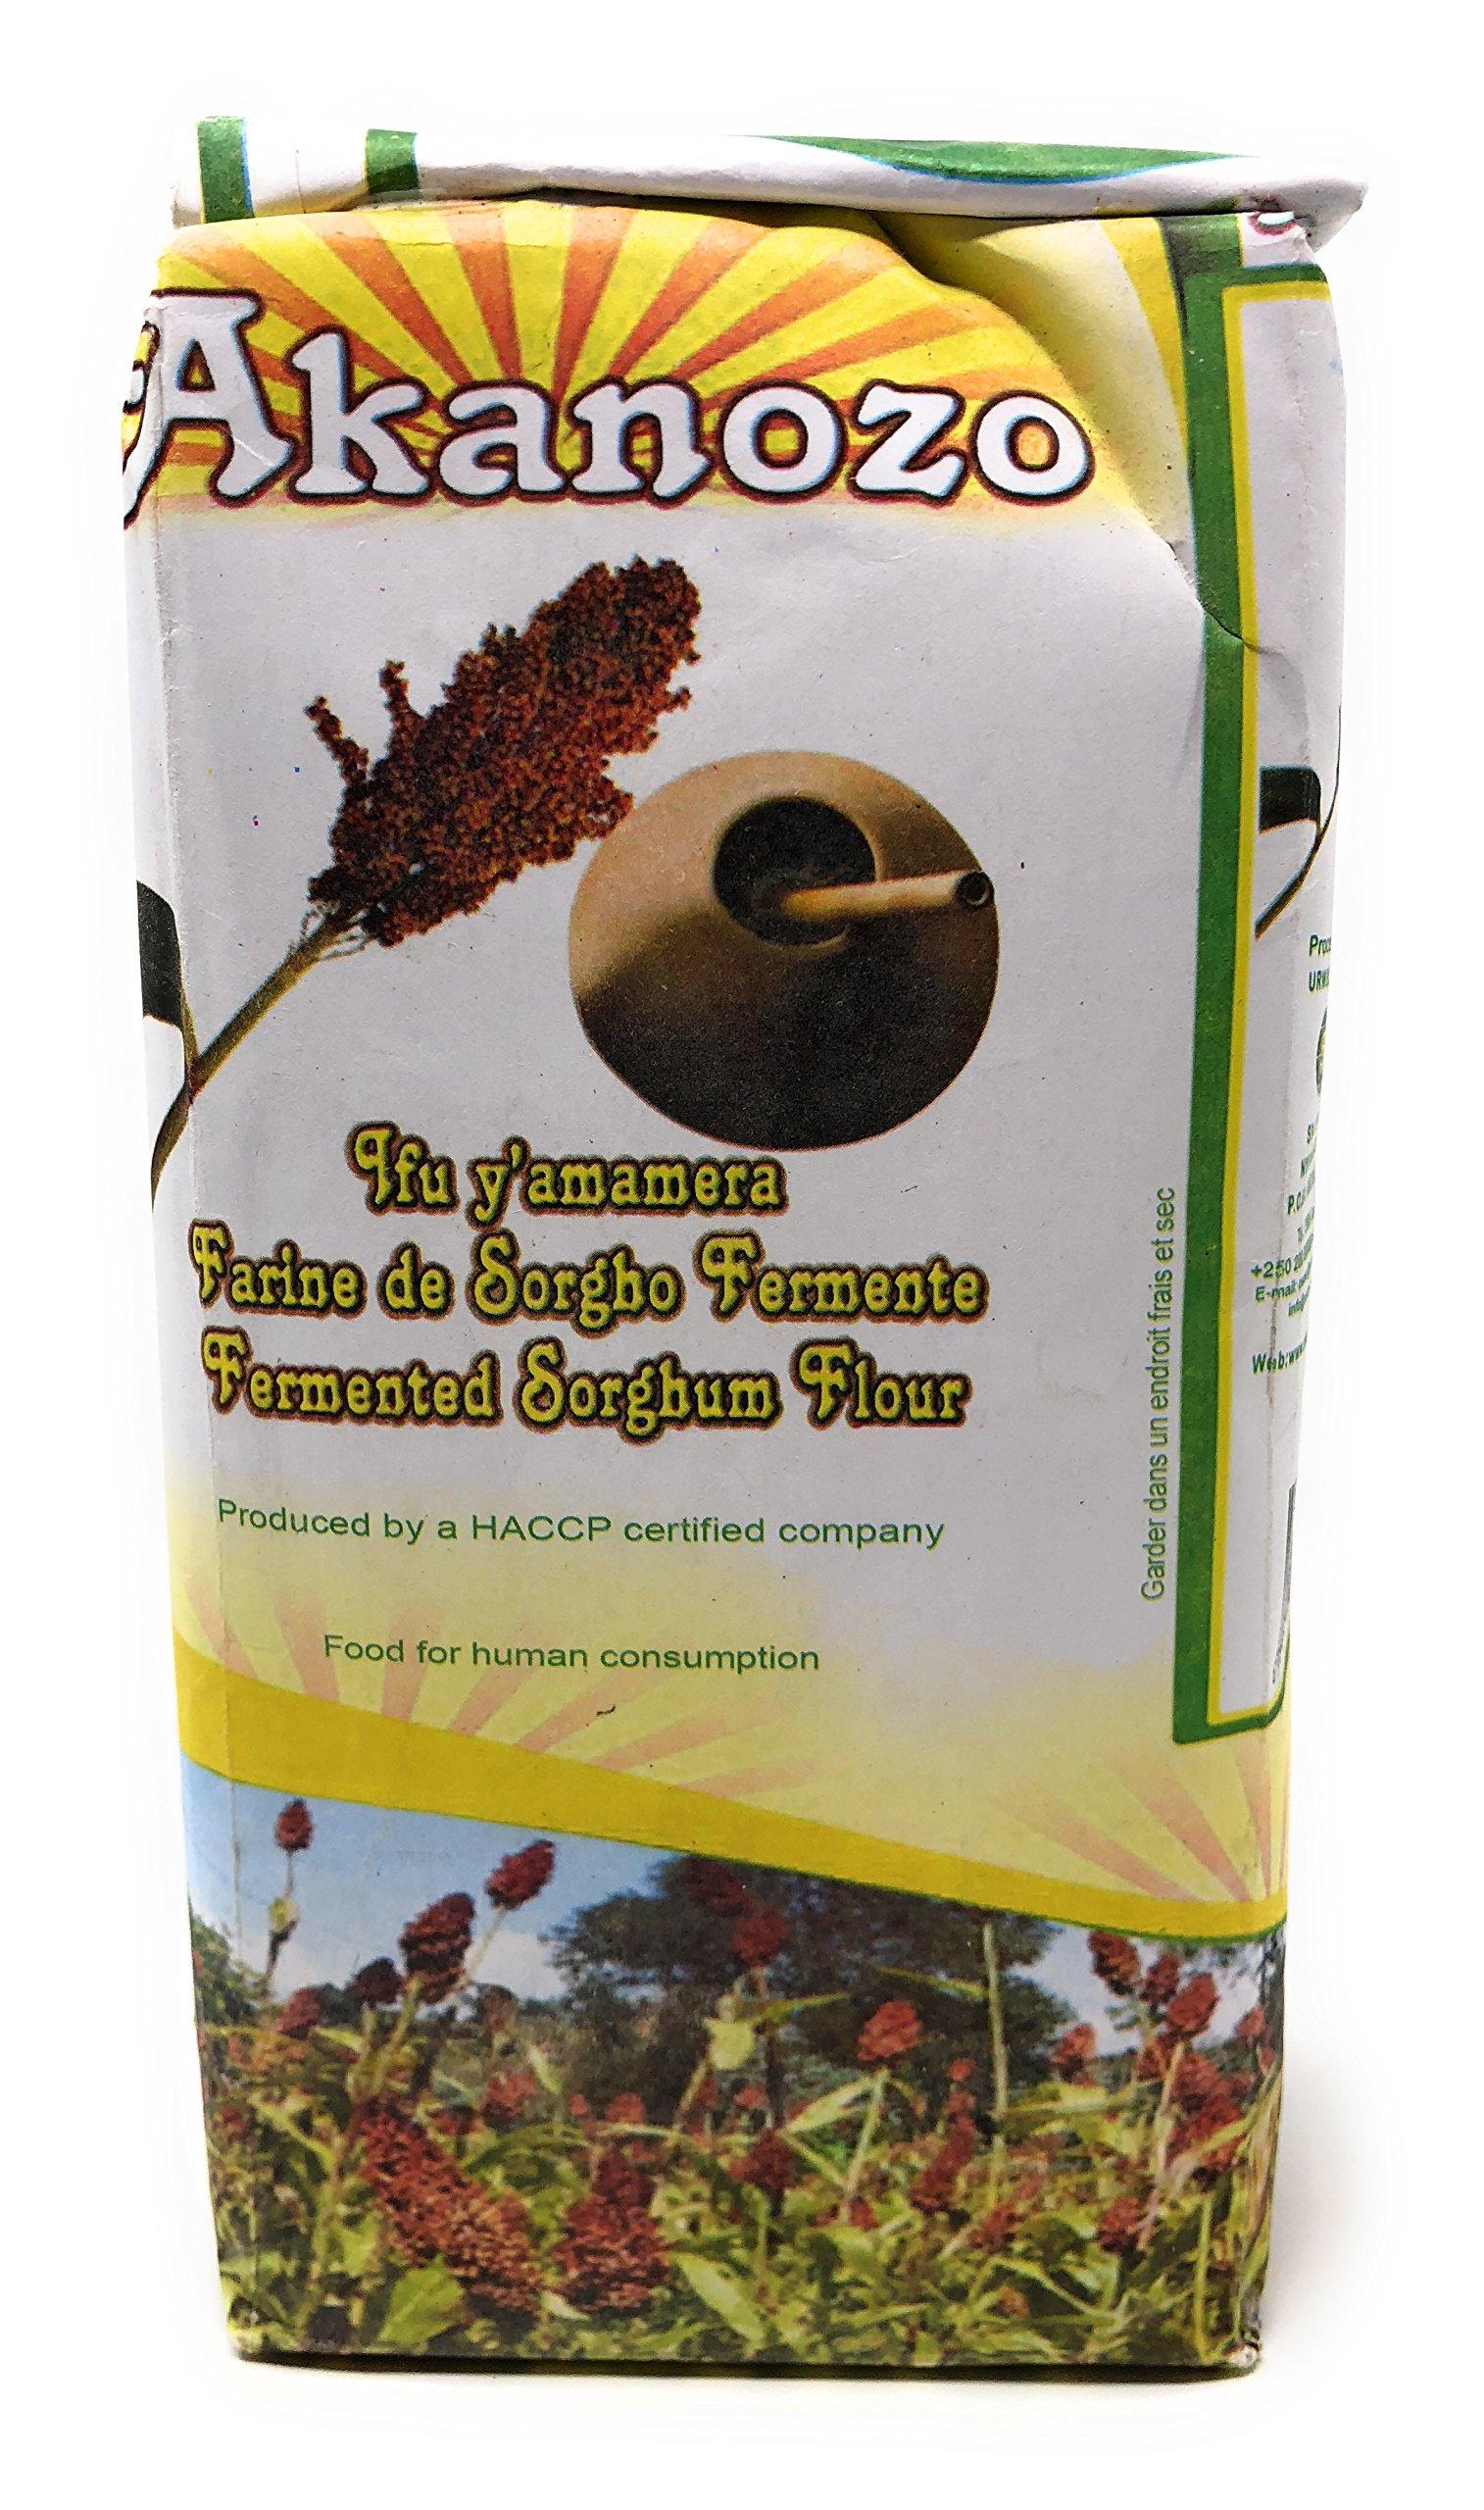 Akanozo''Fermented Sorghum Flour'' (Ifu y'Amamera) 2.2 lbs or 1 kg